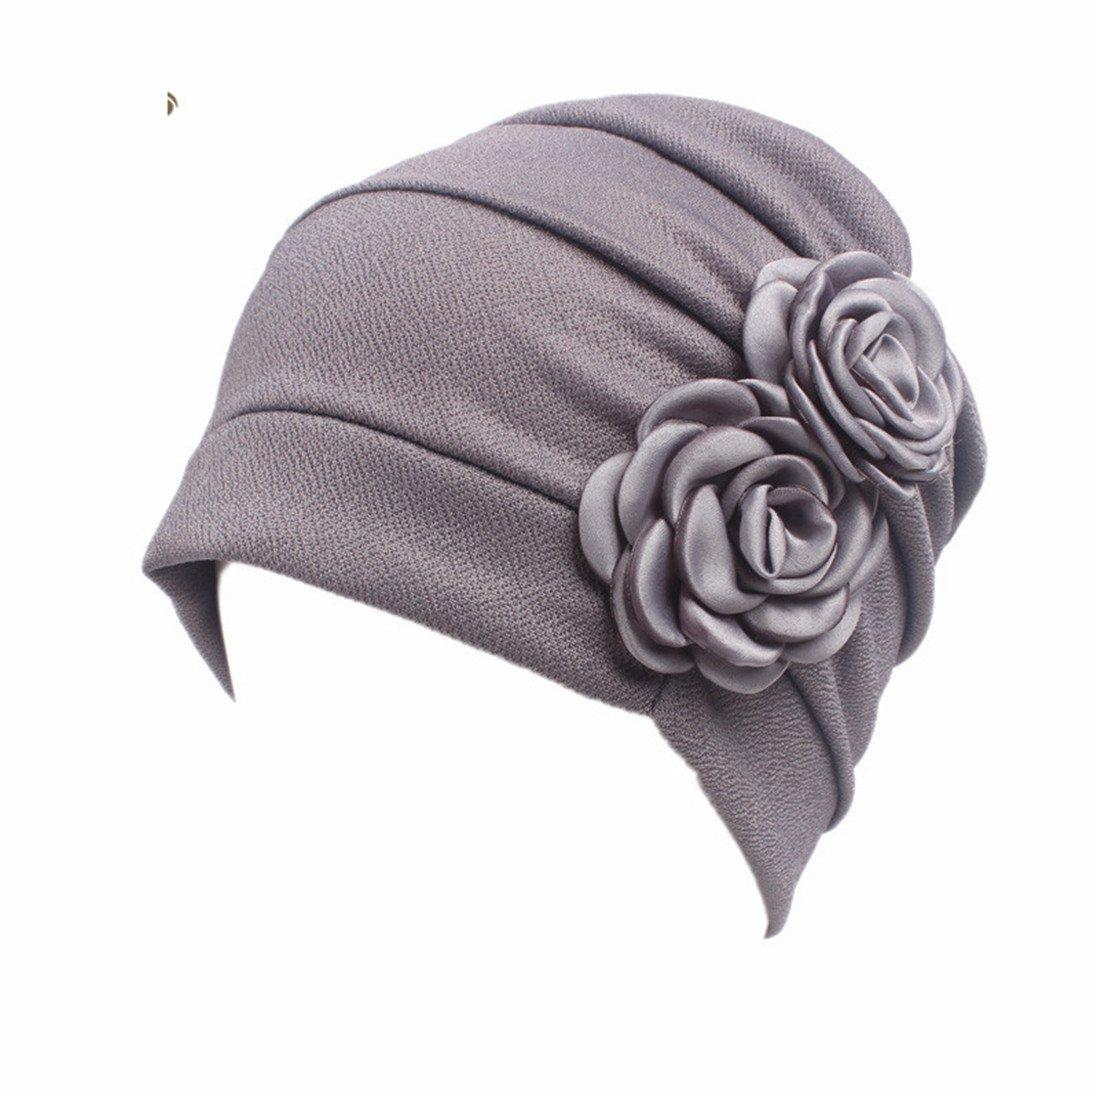 MASTER- Sombreros|Gorras|Aislamiento|Caps Caps quimioterapia Mujer ...